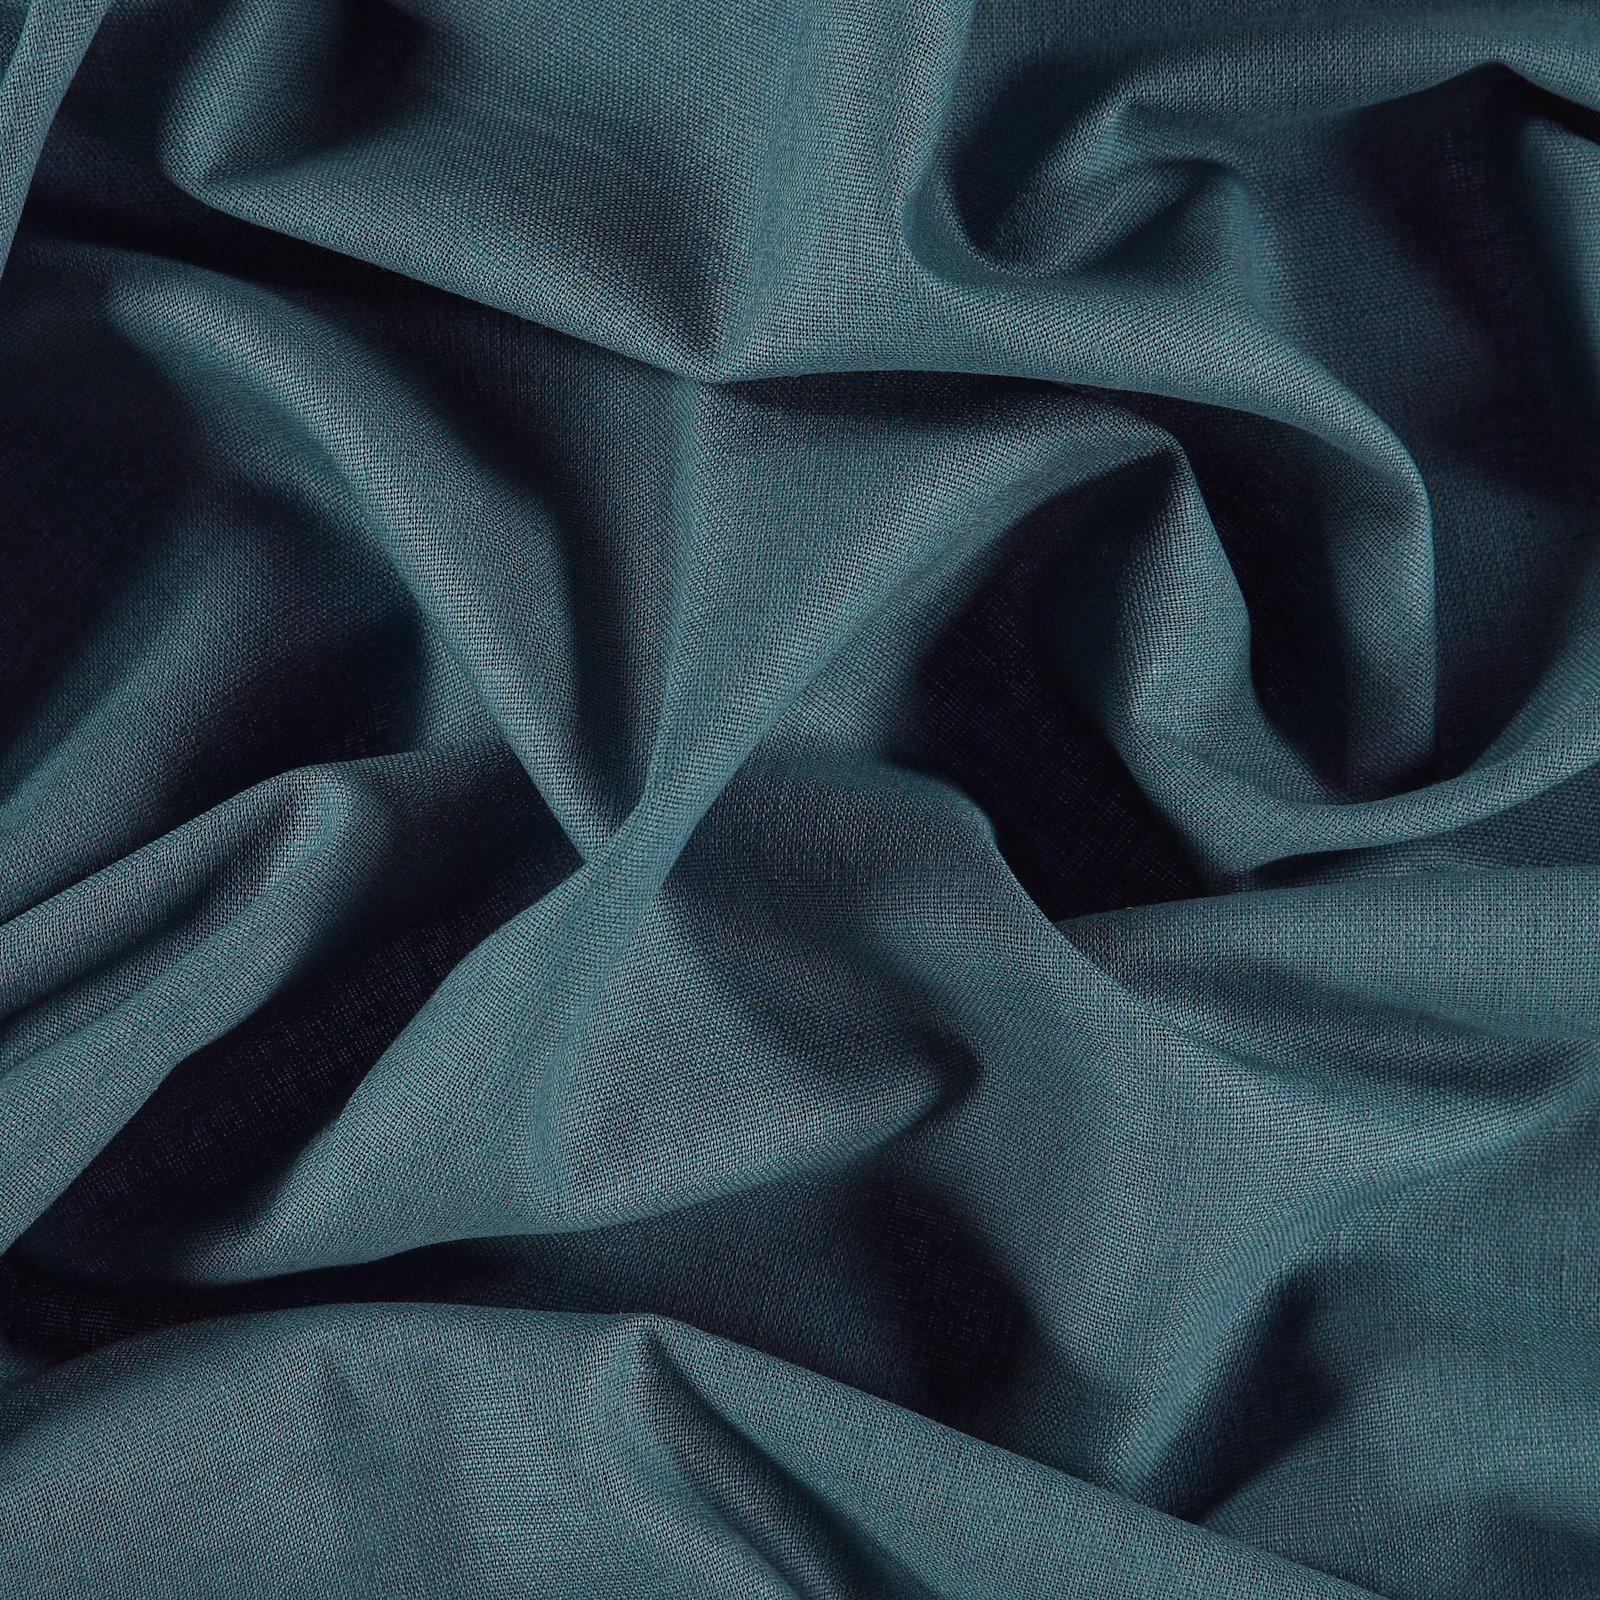 Linen/cotton petrol blue 410129_pack